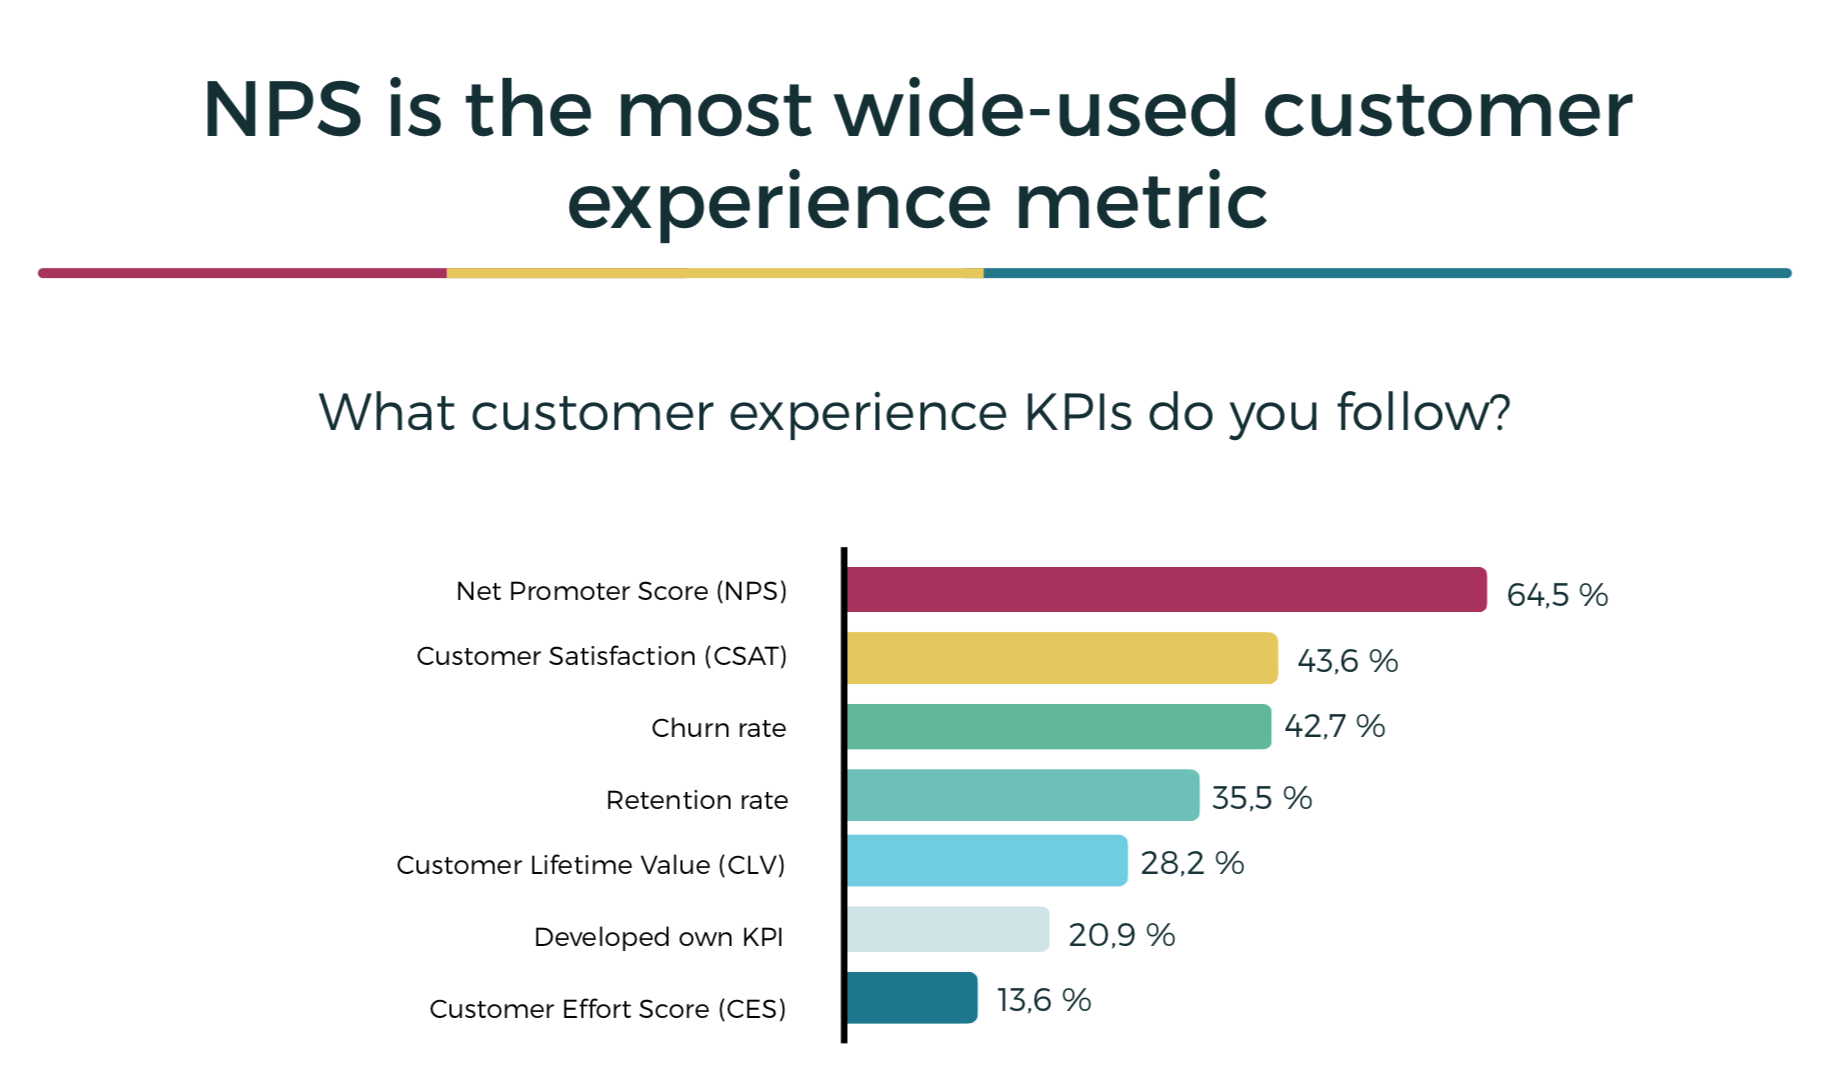 Källa: The State of Customer Experience 2018